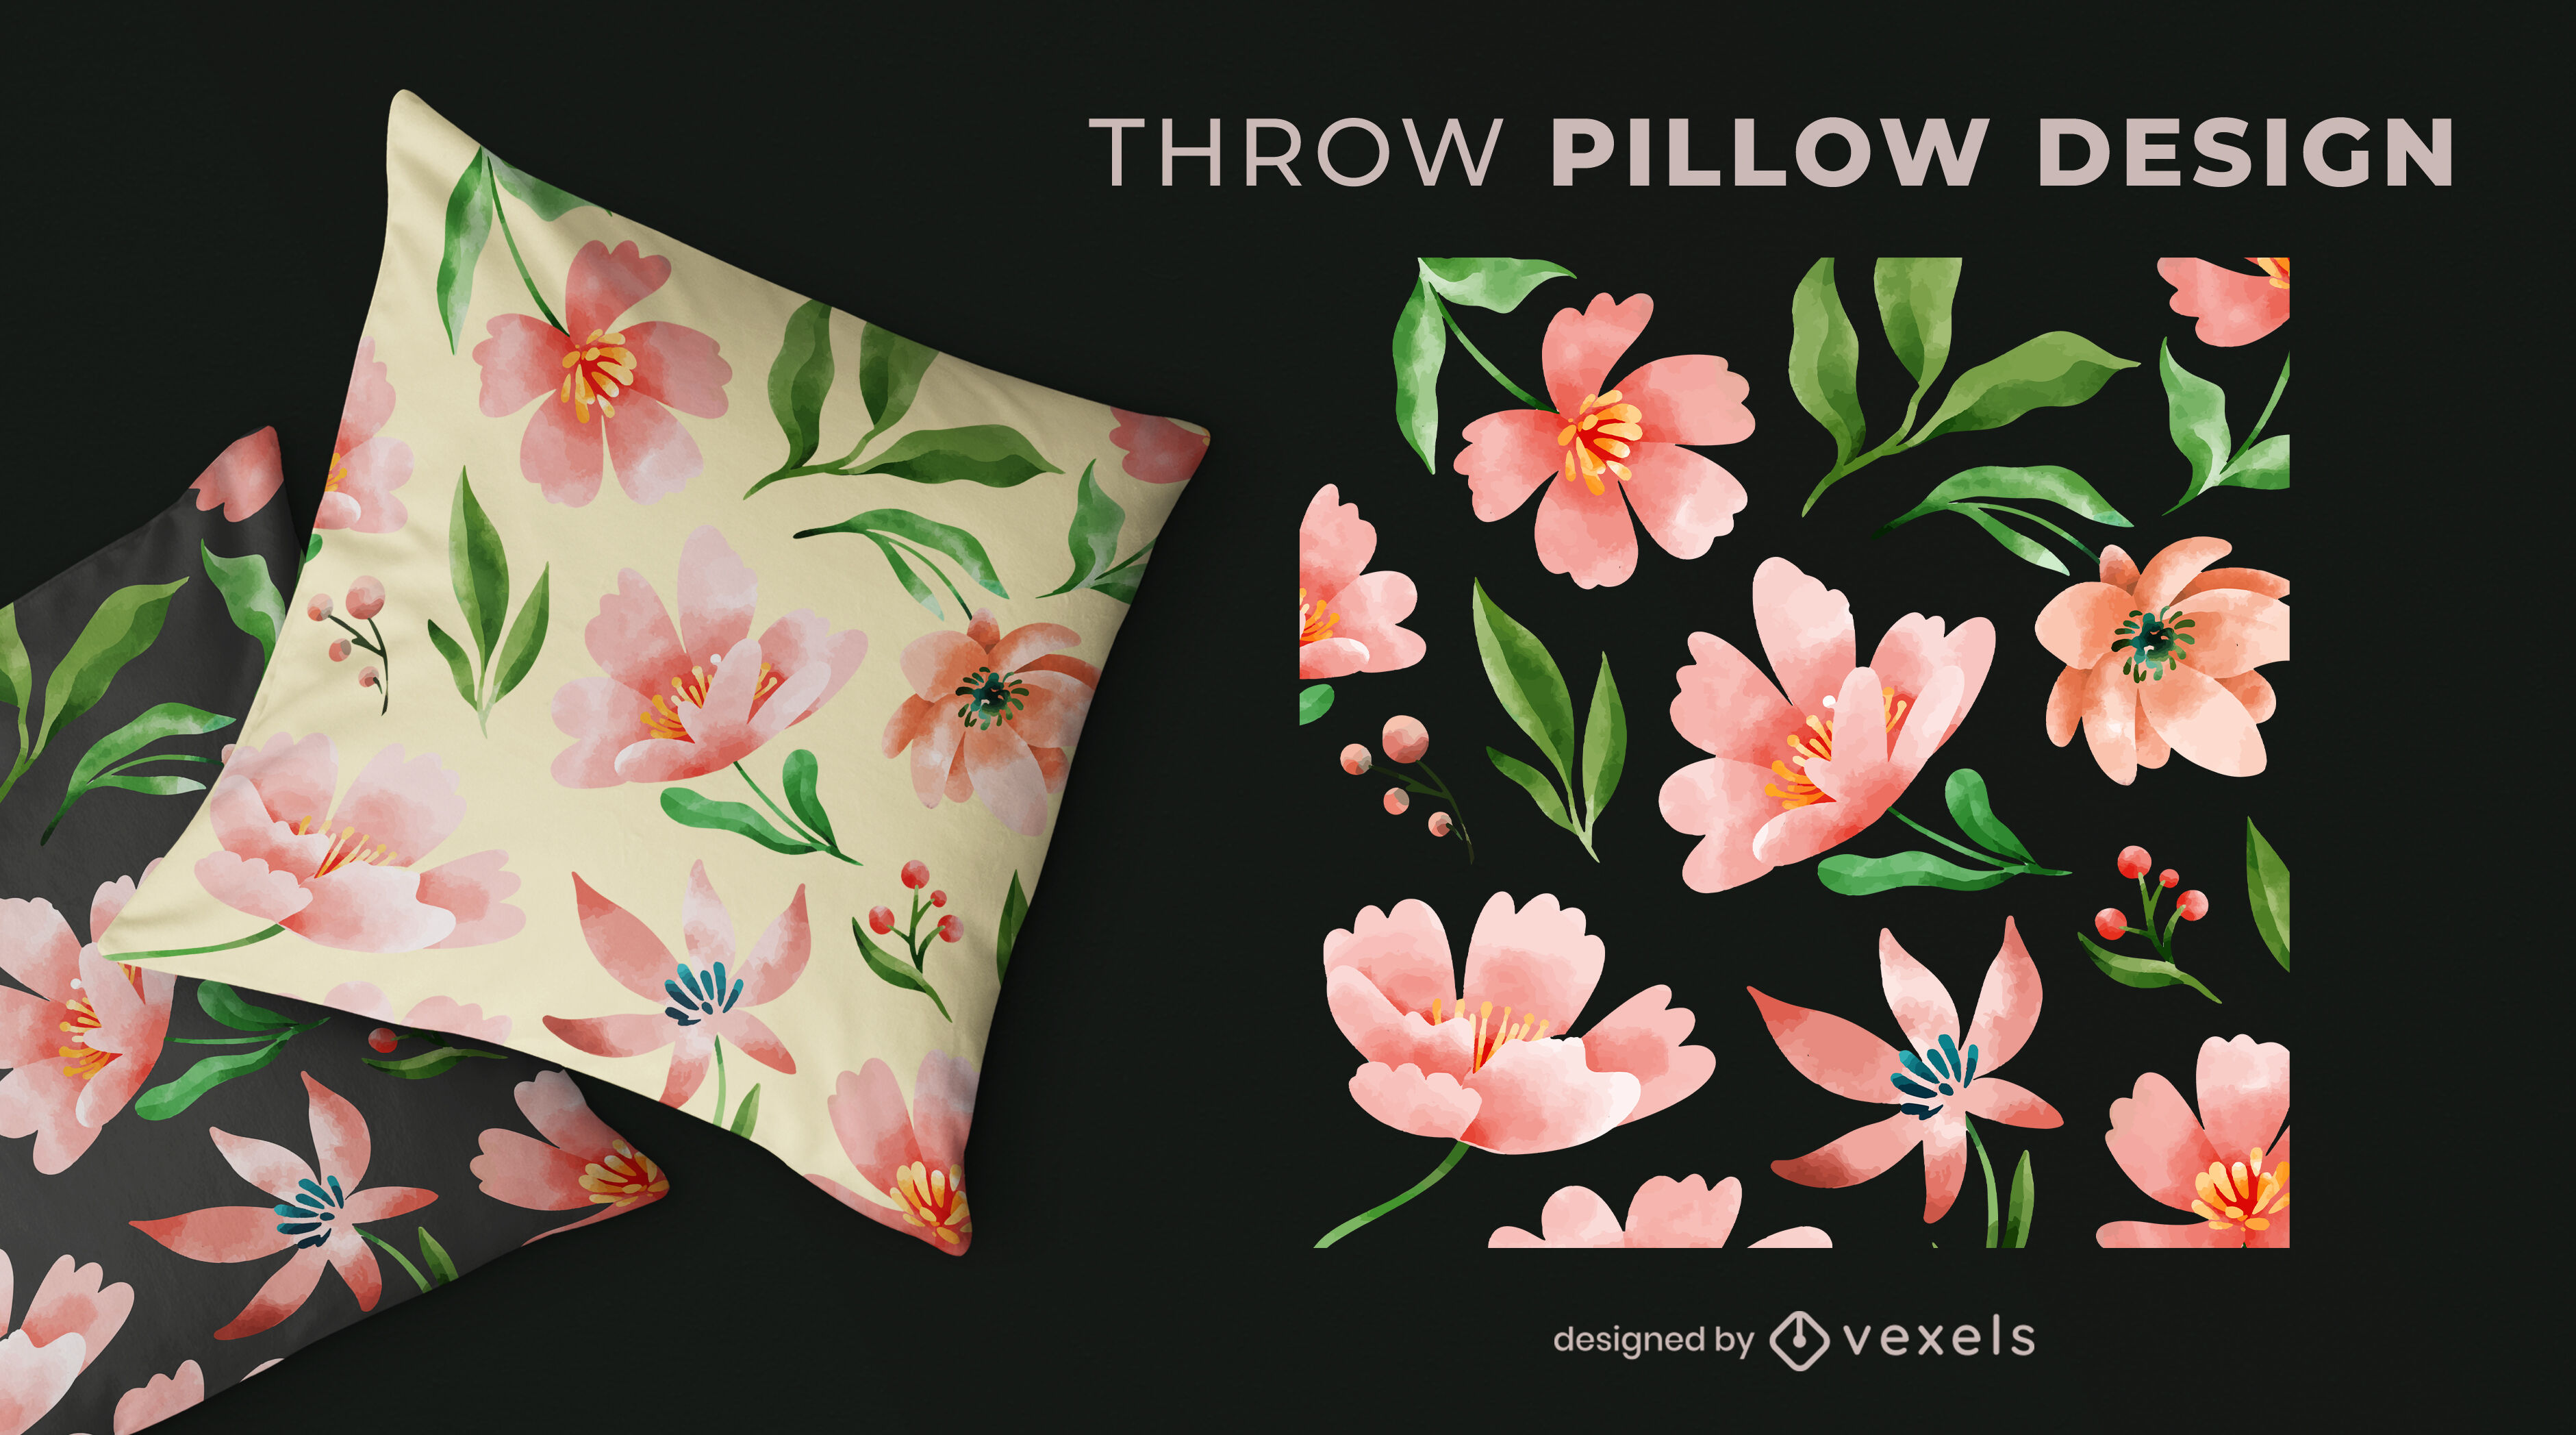 Watercolor pink flowers pattern pillow design